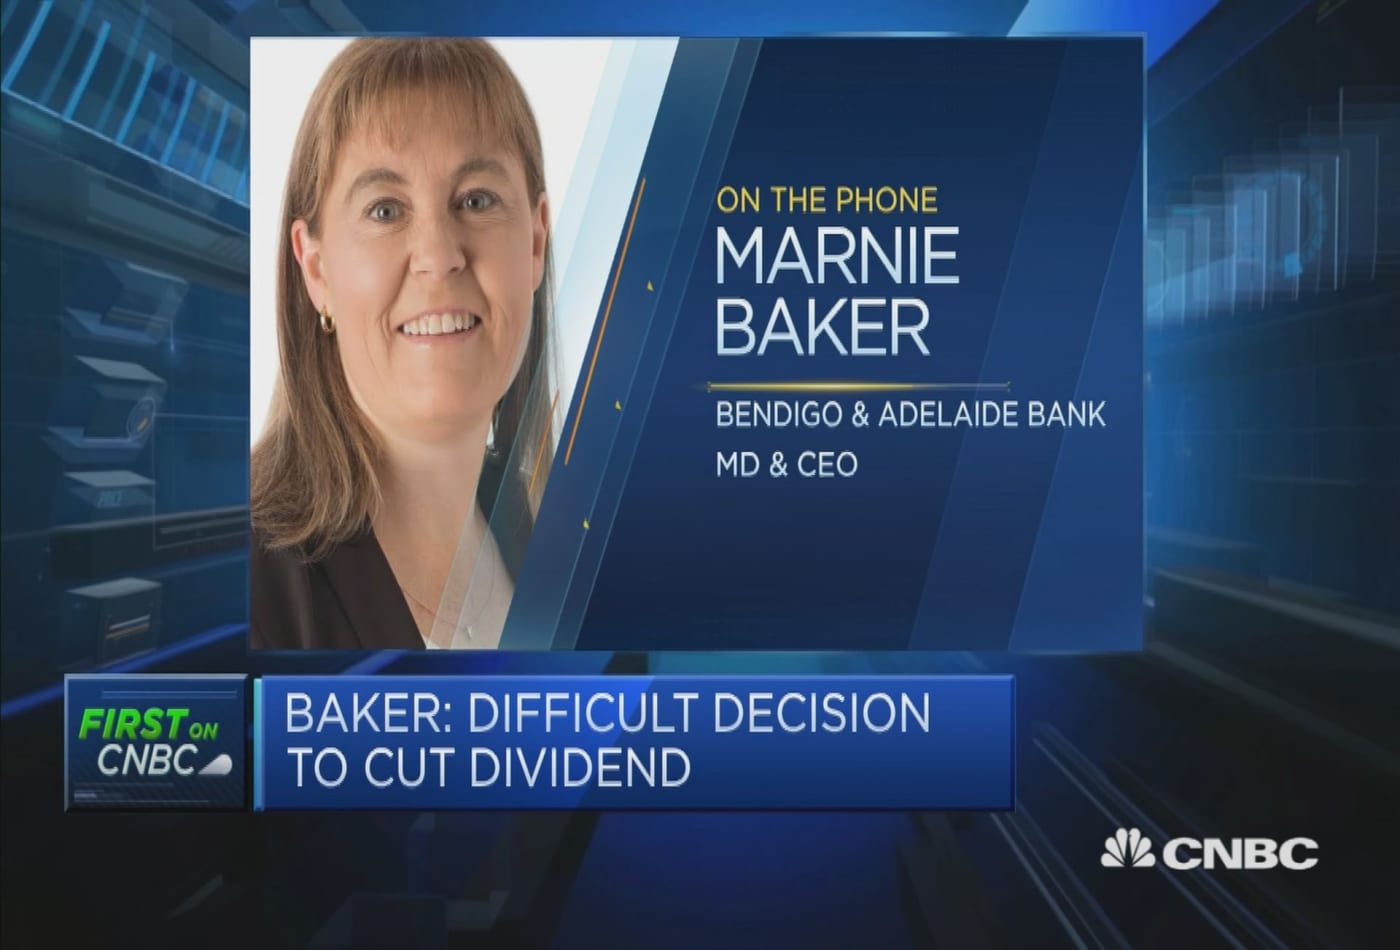 Bendigo and Adelaide Bank CEO explains the decision to cut dividend